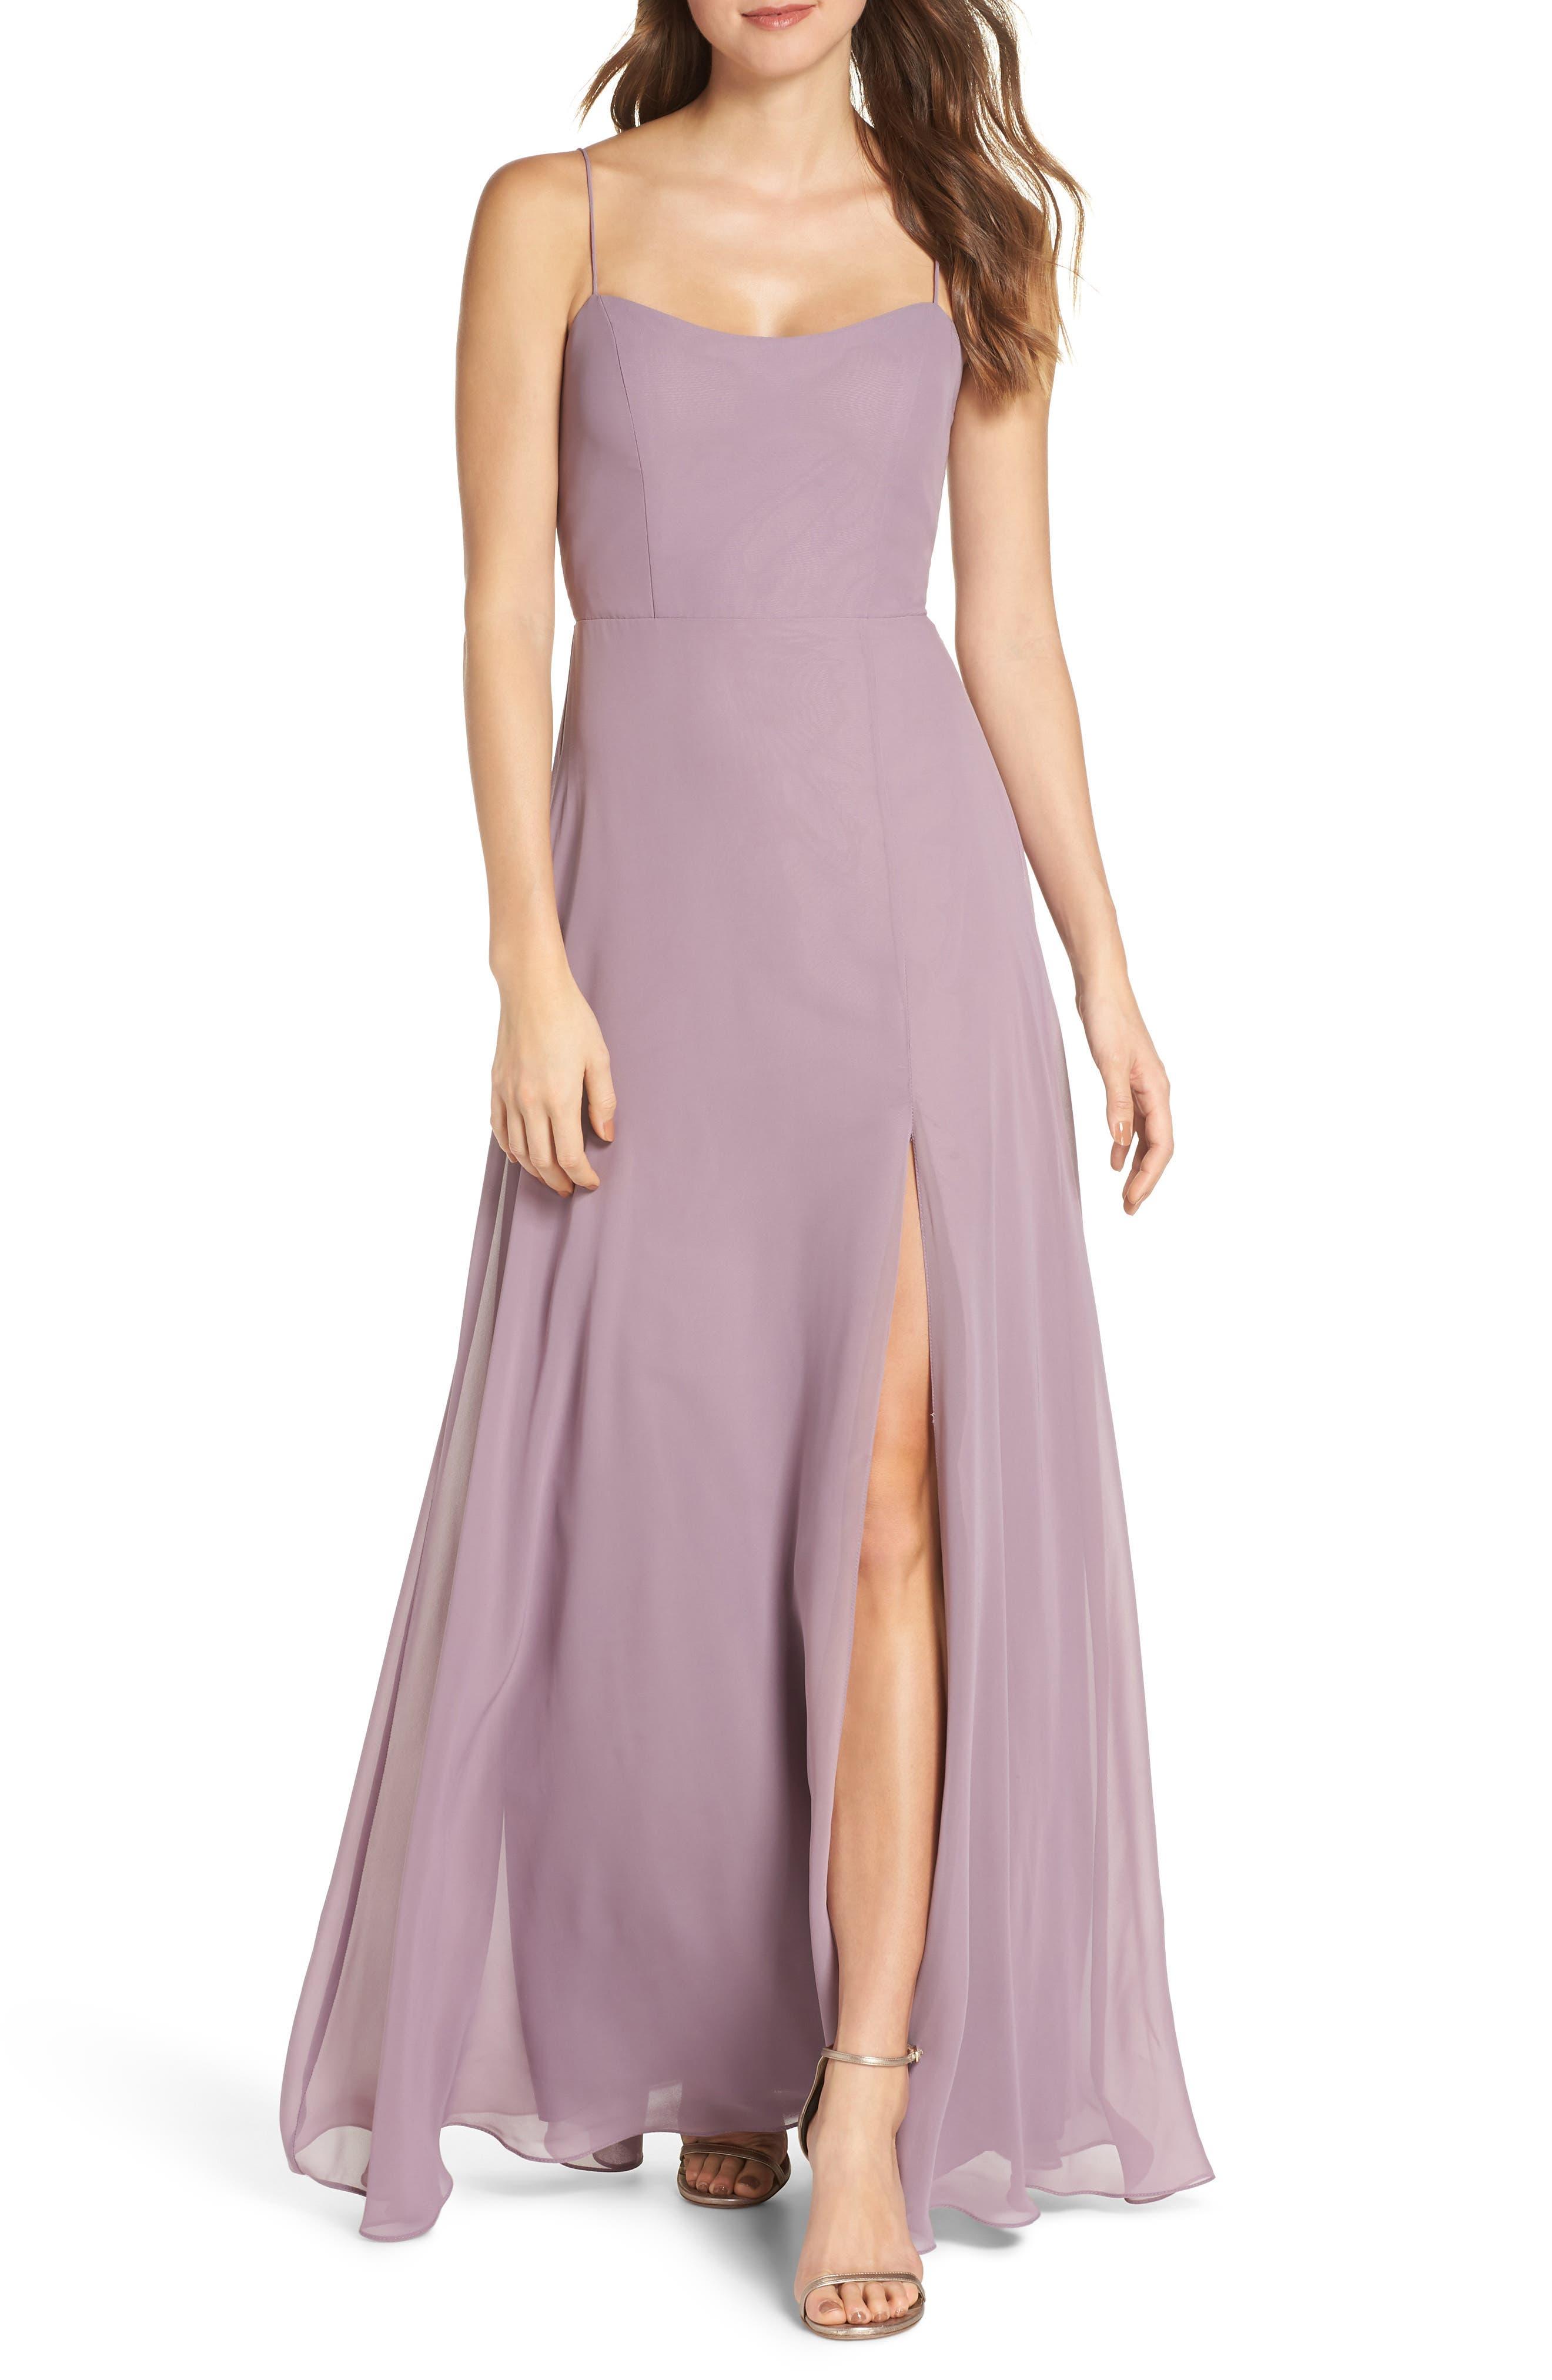 Jenny Yoo Kiara Bow Back Chiffon Evening Dress, Purple